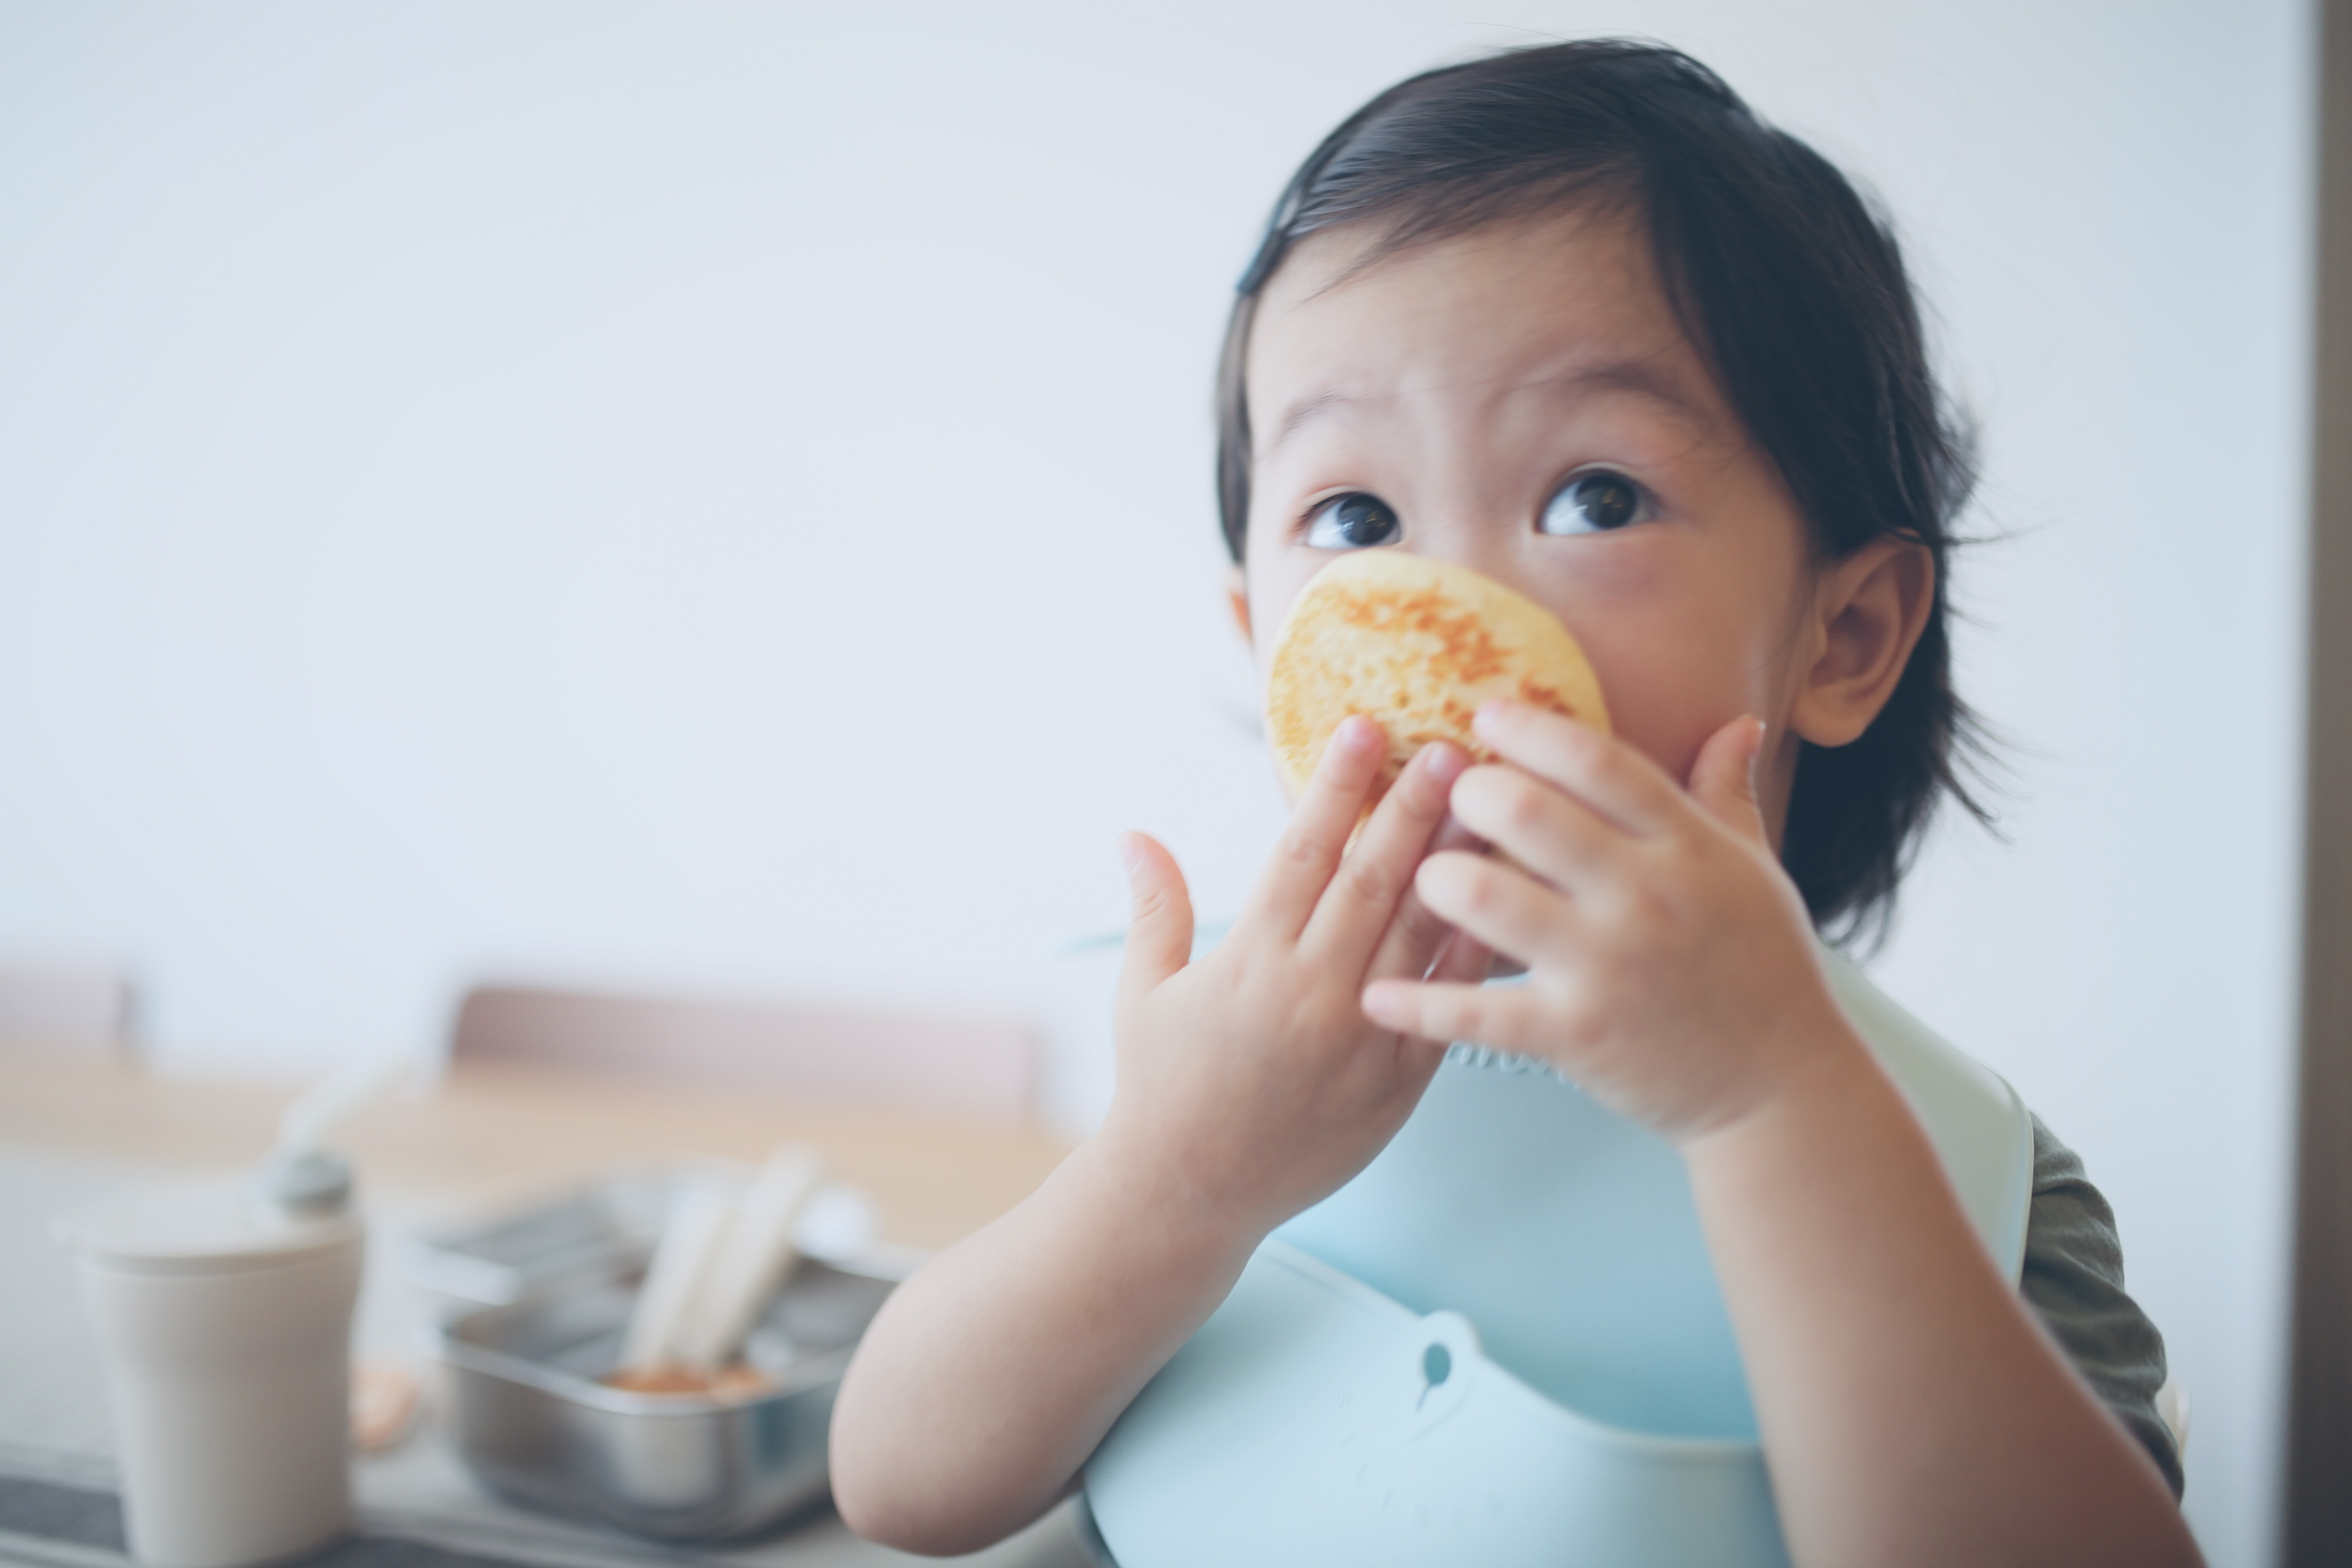 【 Miniware 育兒里程碑│培養9個月大寶寶自主進食的5個訣竅】 – Miniware 微兒天然寶貝用品